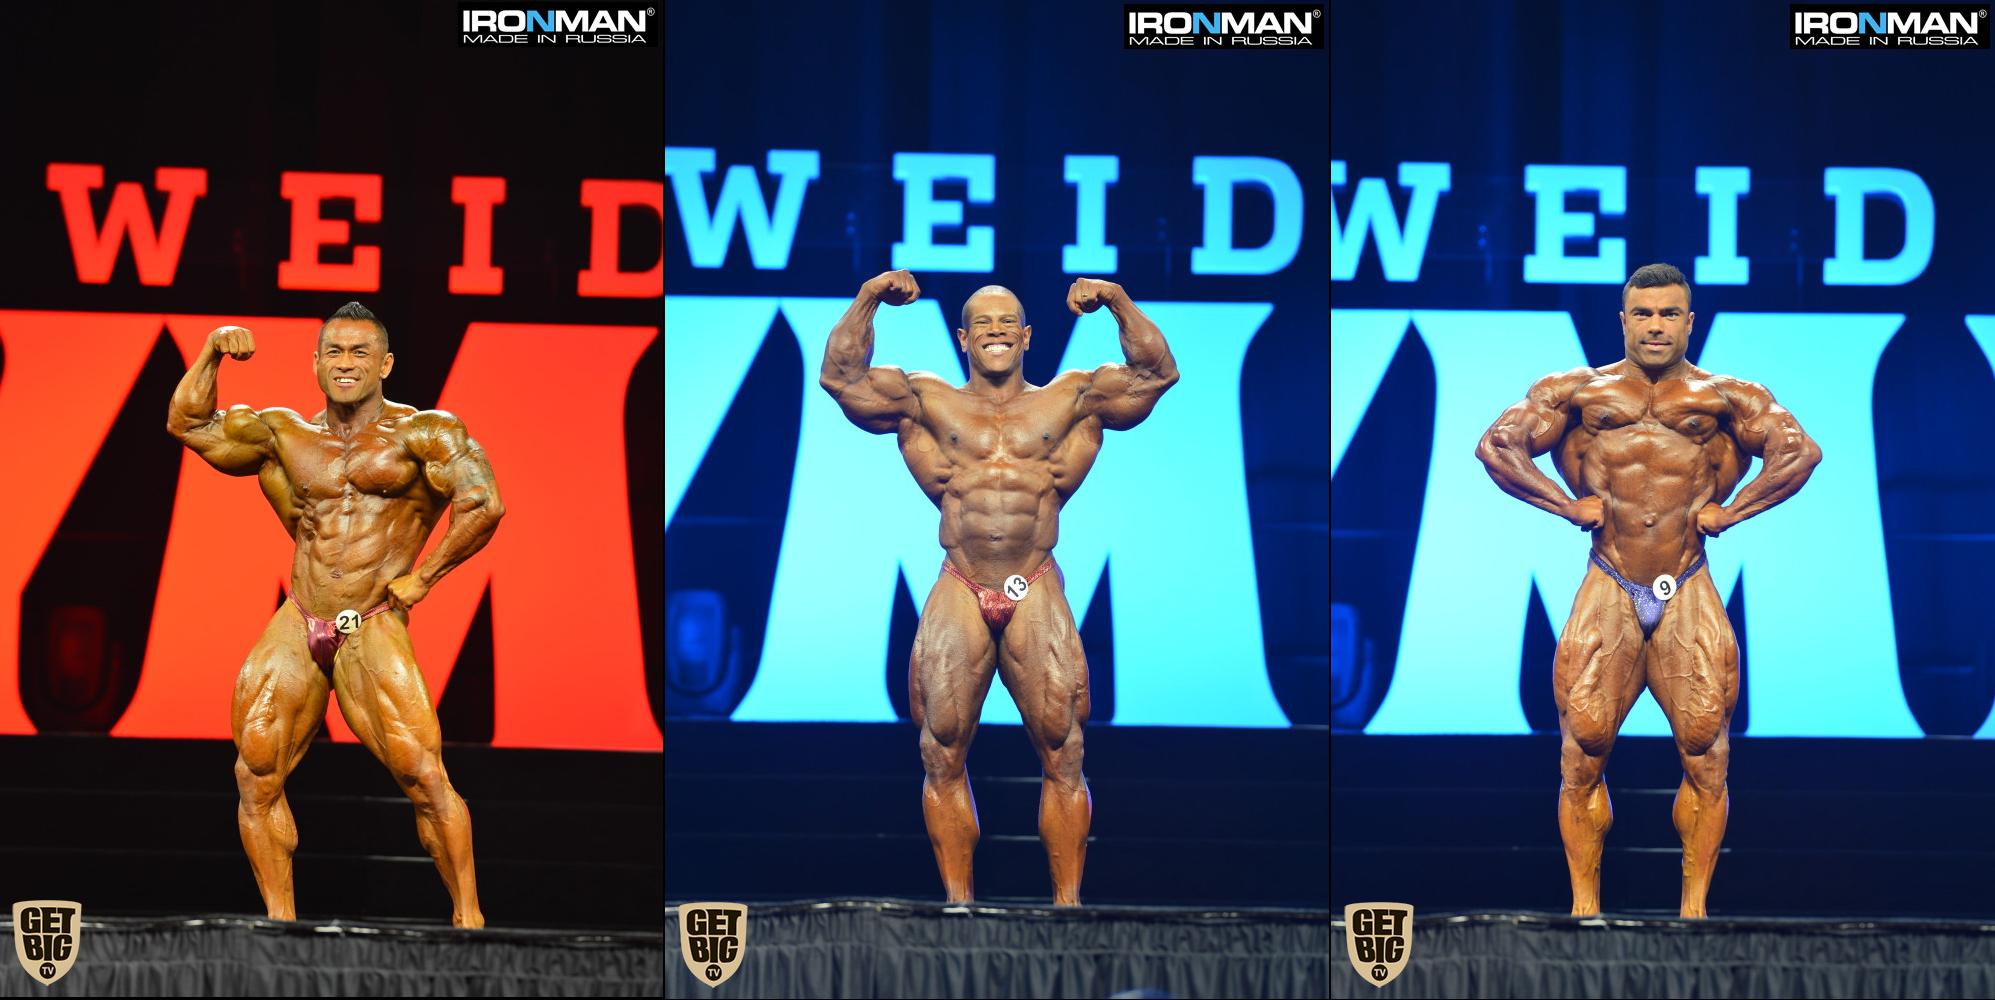 Хидетада Ямагиши (3 место), Девид Хенри (4 место), Эдуардо Корреа (5 место)